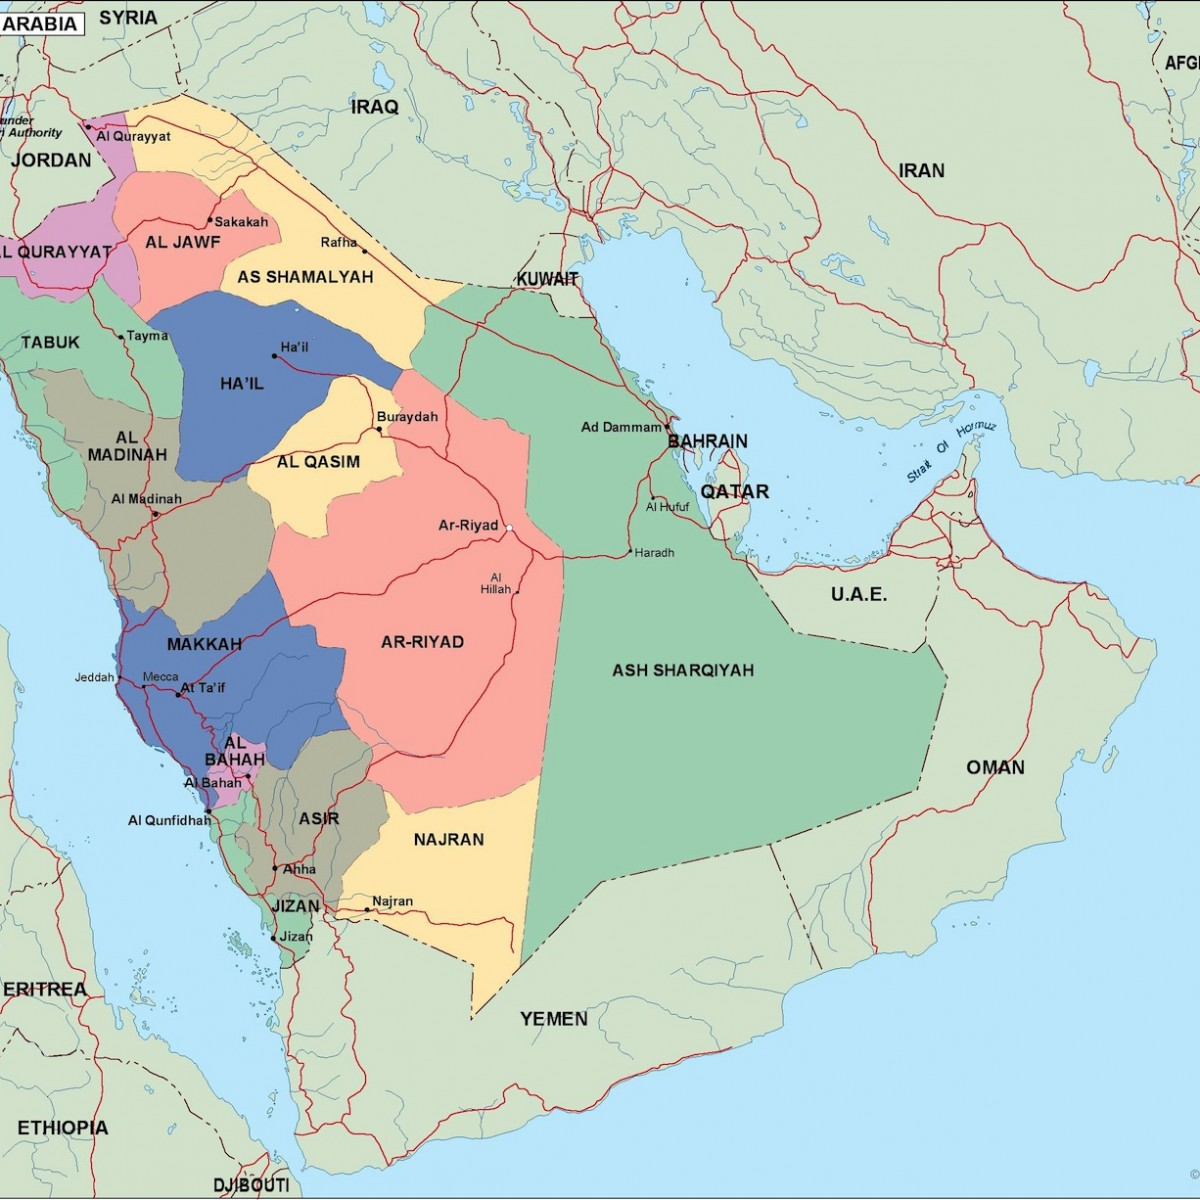 saudi arabia political map. Eps Illustrator Map | Vector World Maps